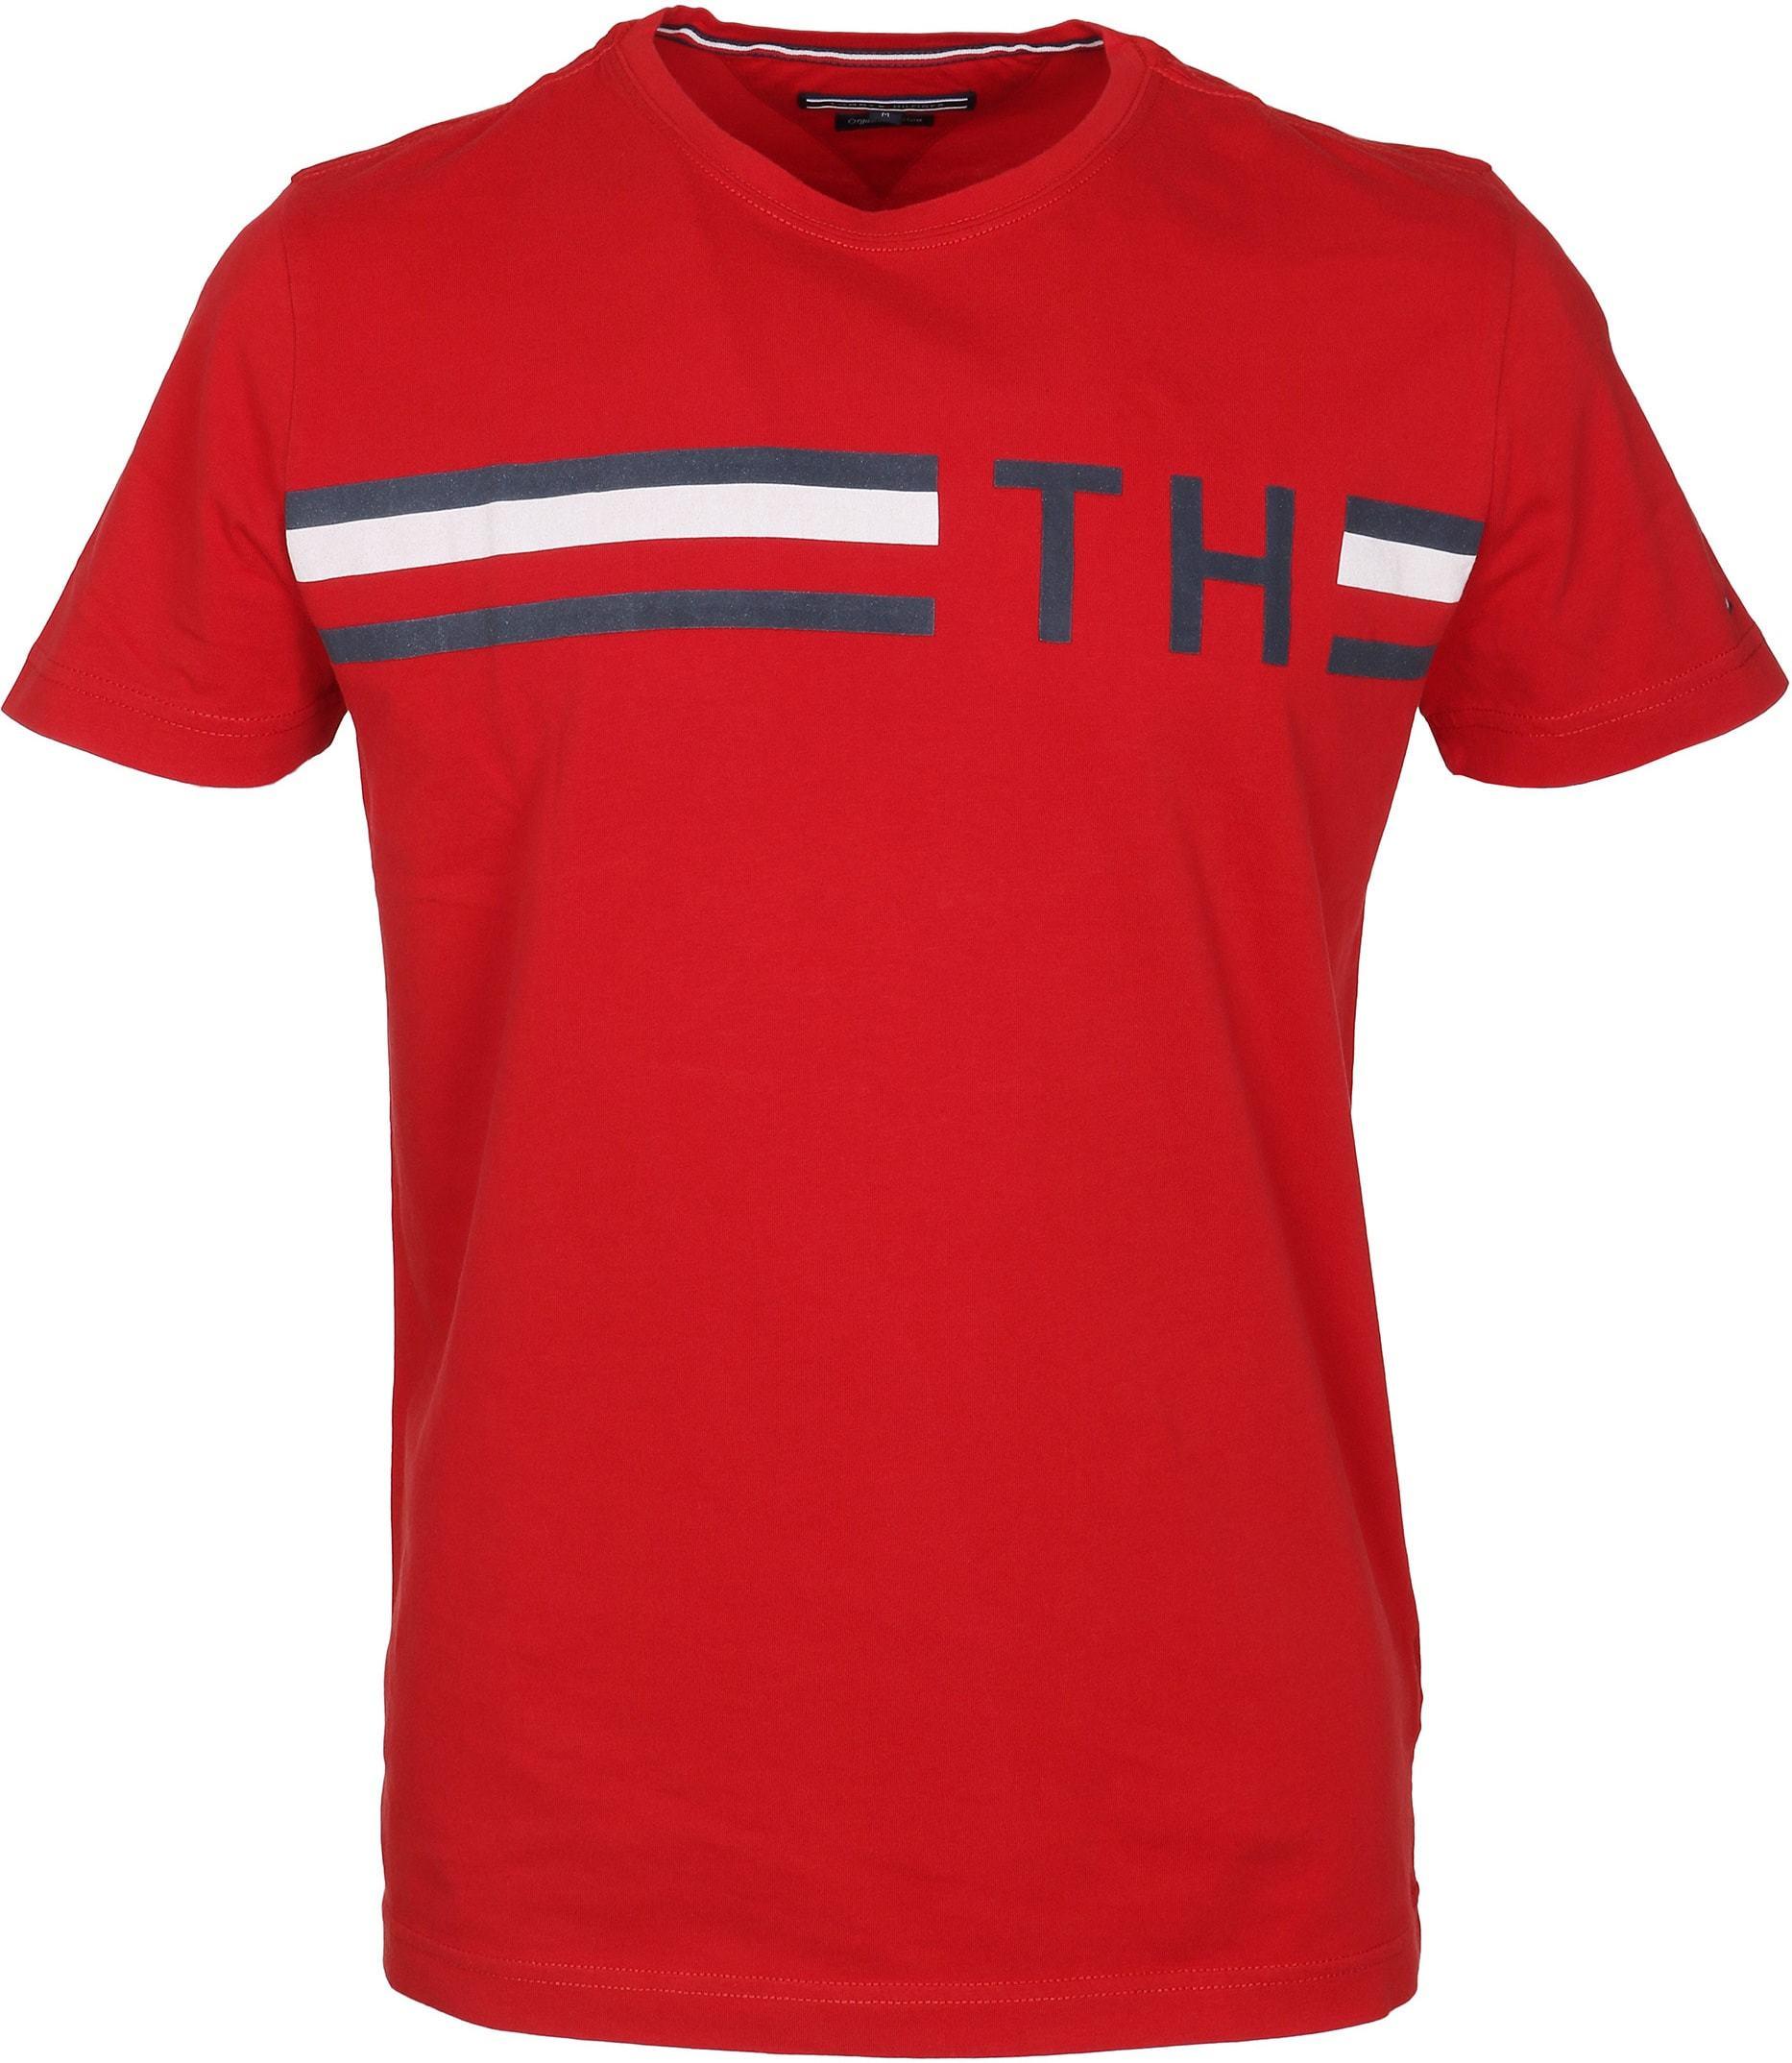 Tommy Hilfiger T-shirt TH Rot foto 0